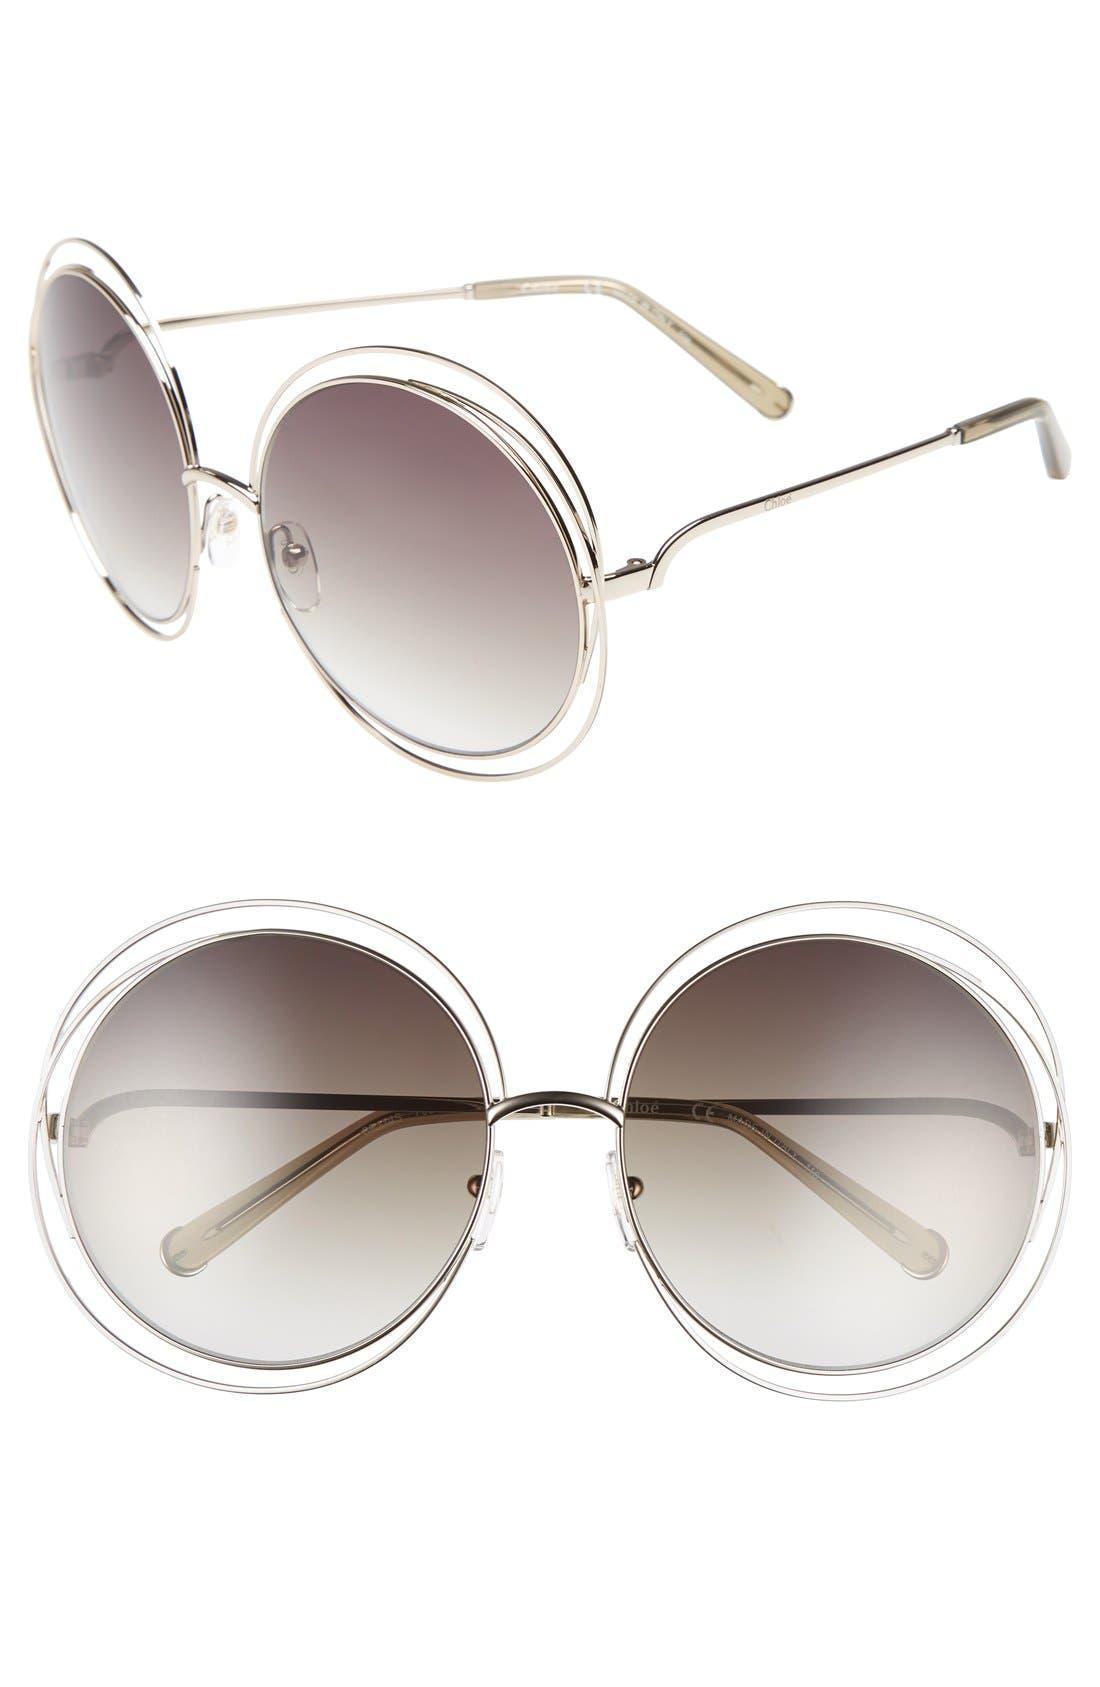 CHLOÉ, 62mm Oversize Sunglasses, Main thumbnail 1, color, GOLD/ TRANSPARENT GREEN